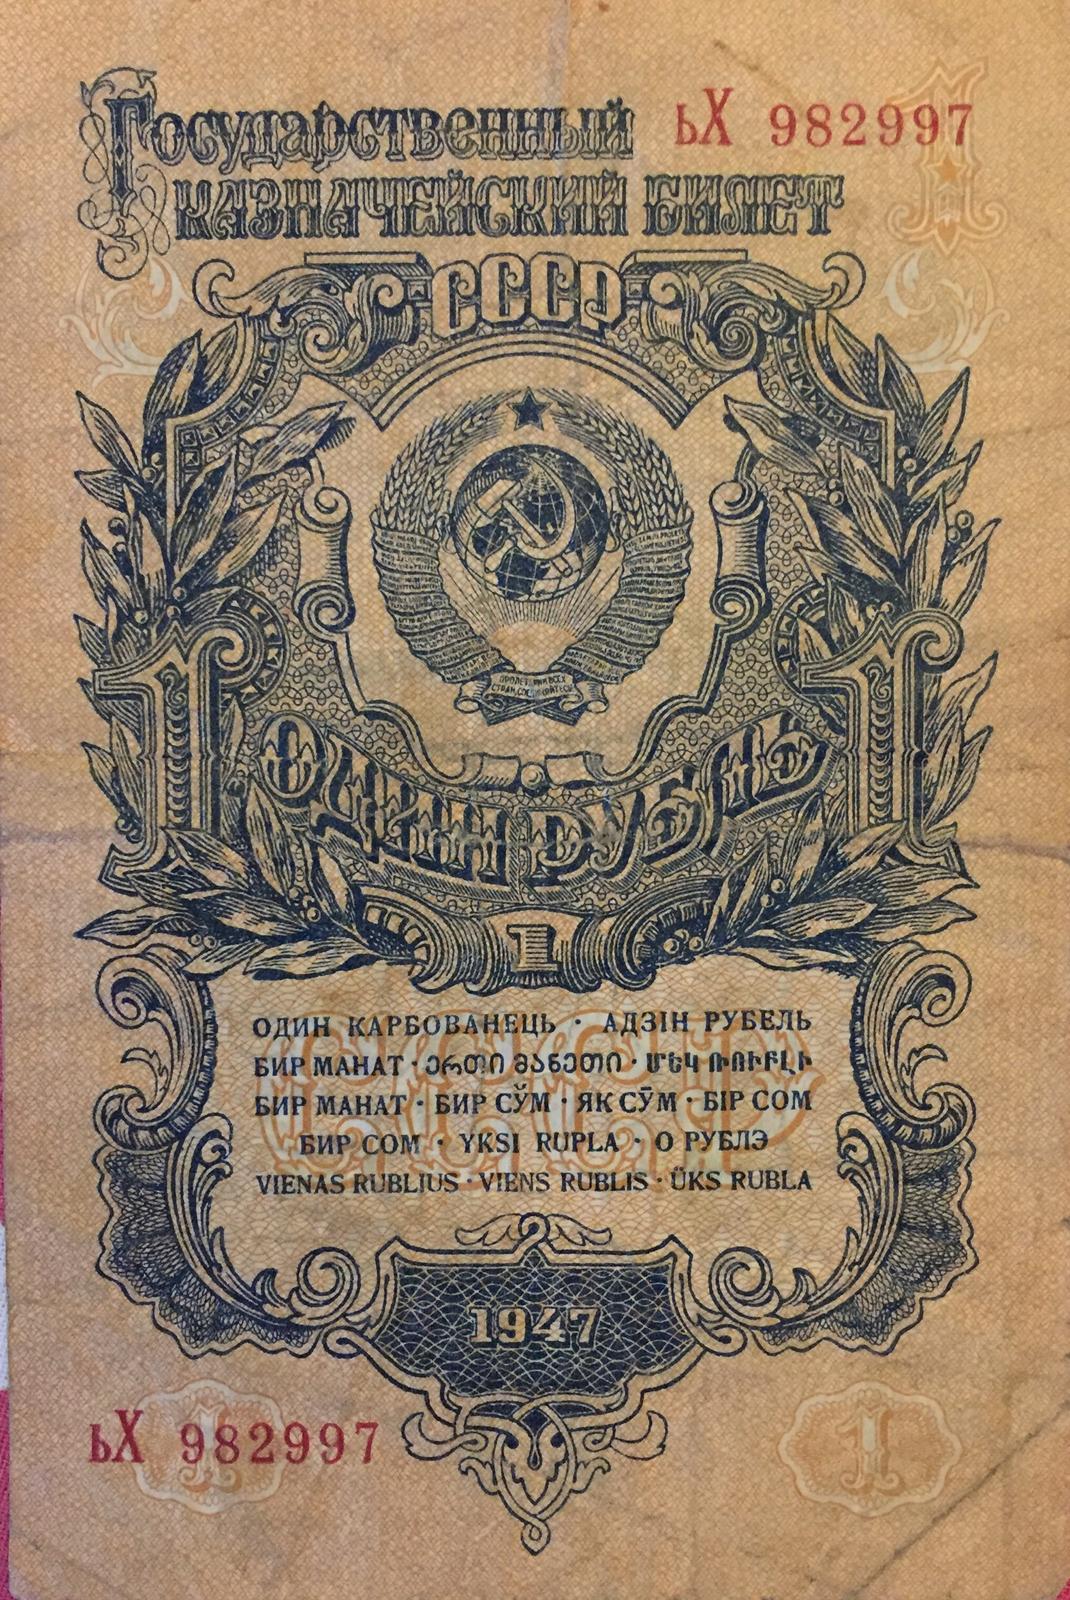 Perníková chalúpka - Obrázok č. 19